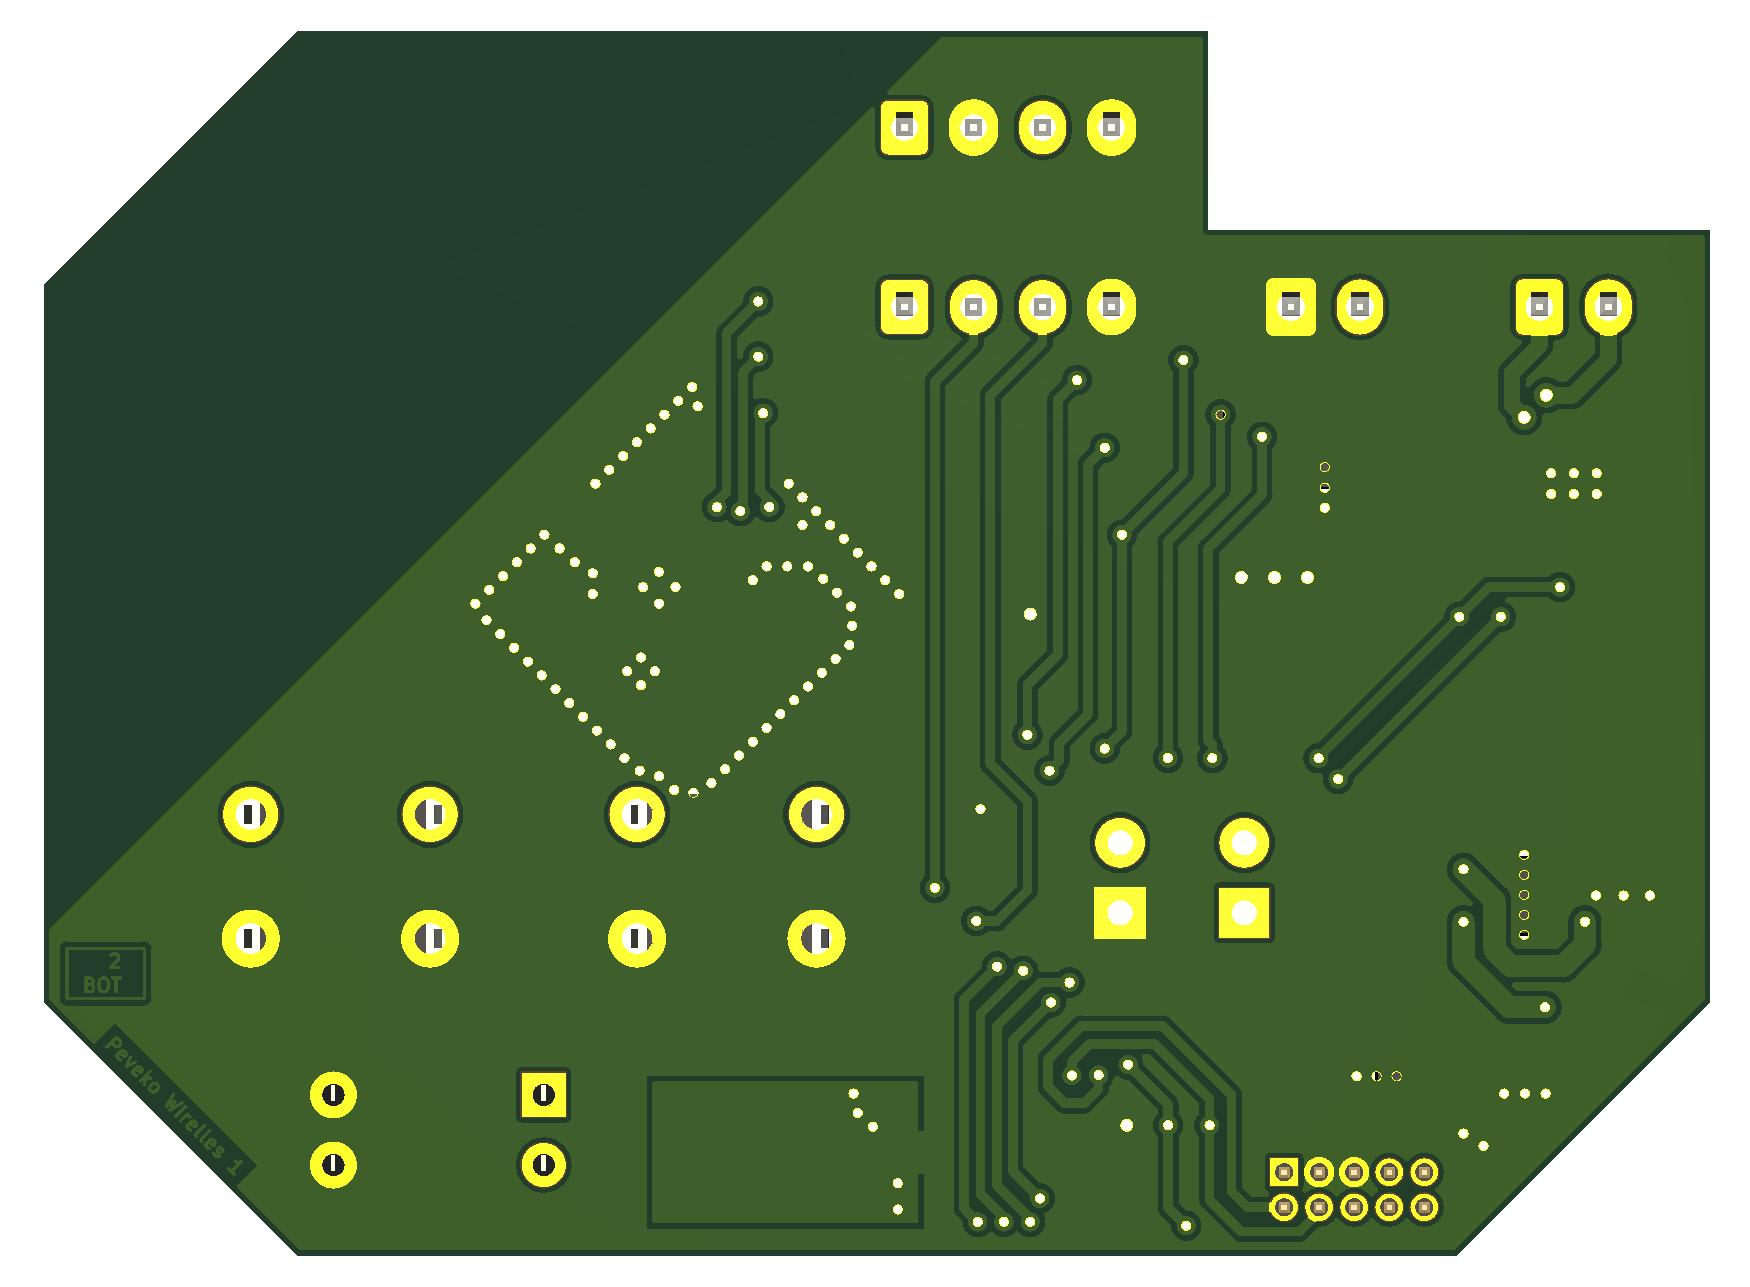 img/PCB_bot.png